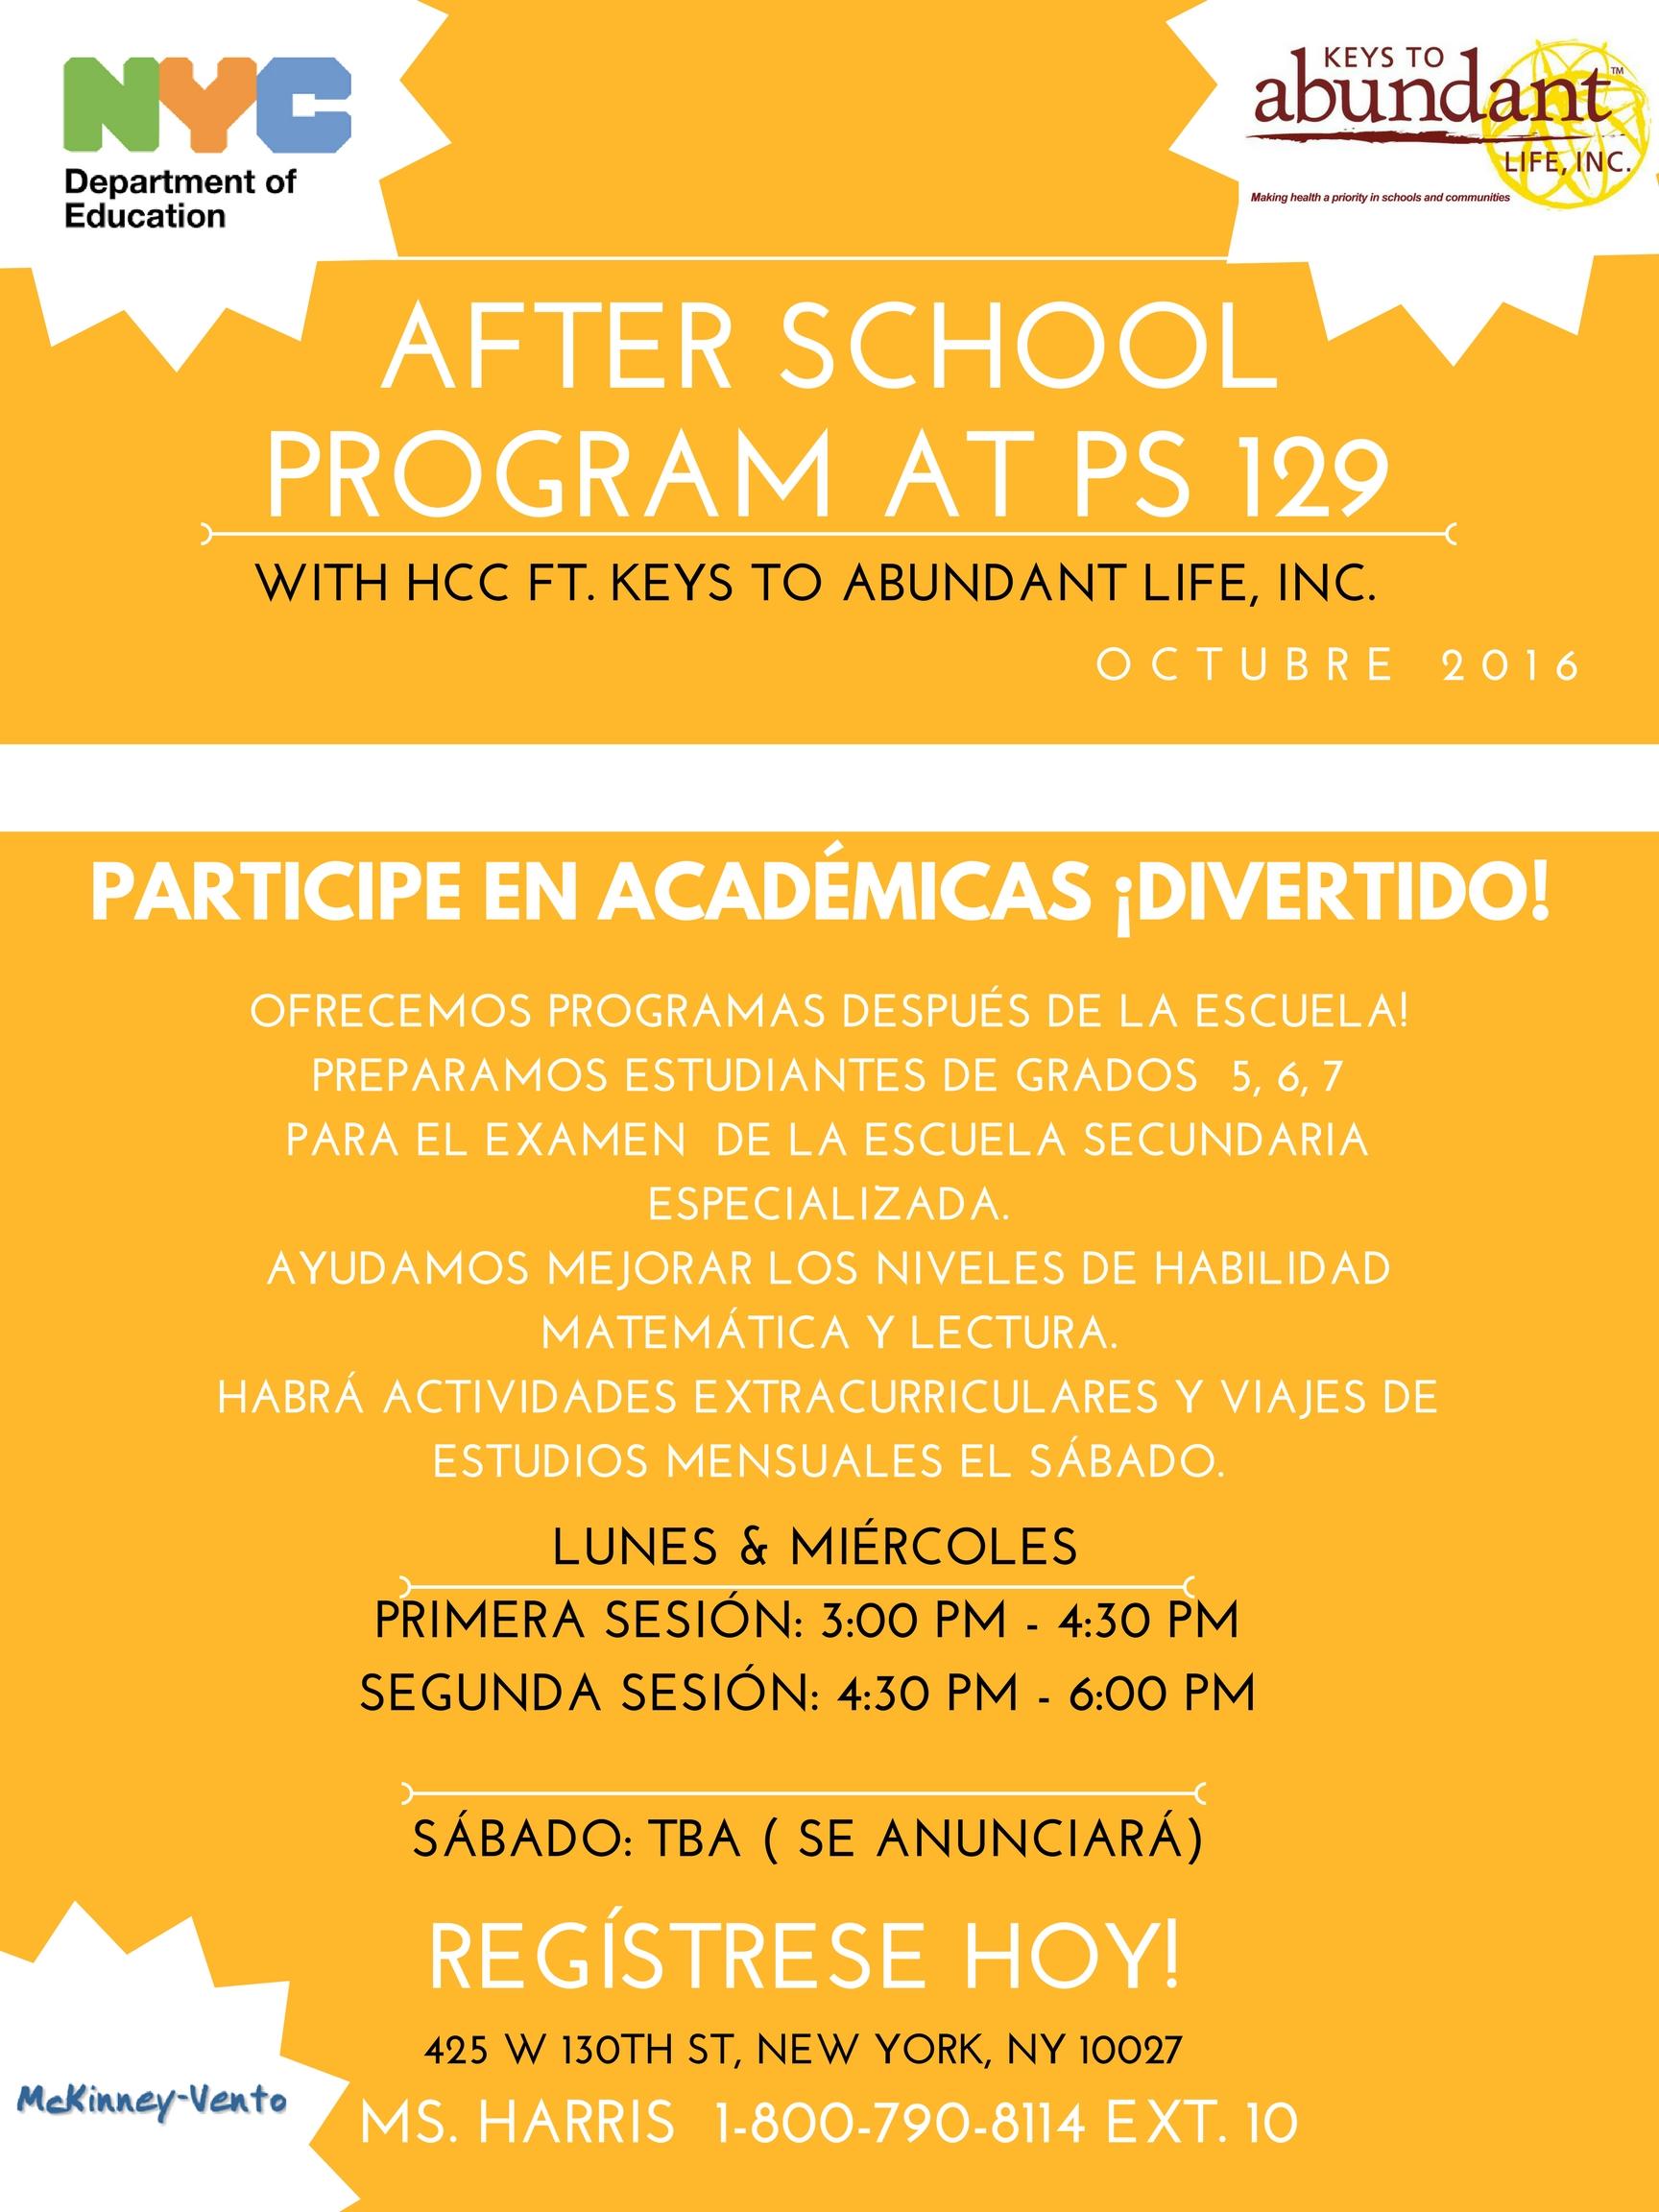 AFTERSCHOOL PROGRAM AT P.S 129